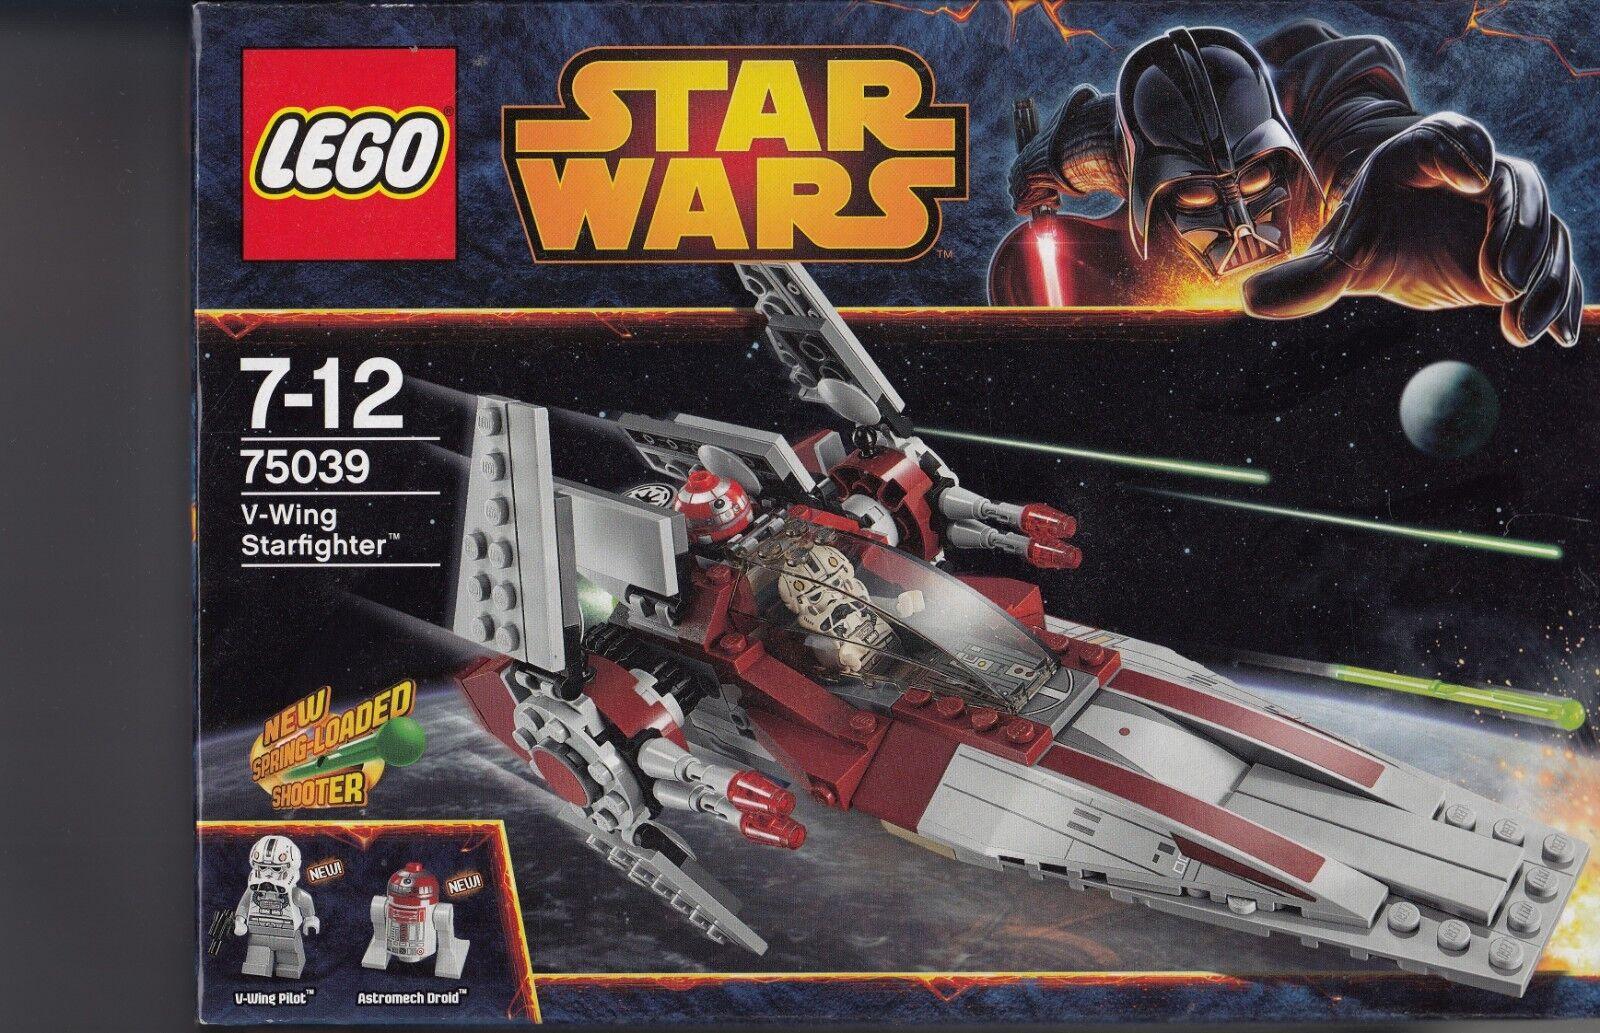 NEU & OVP LEGO Star Wars 75039 V-Wing Starfighter Figuren Pilot Droid Shooter